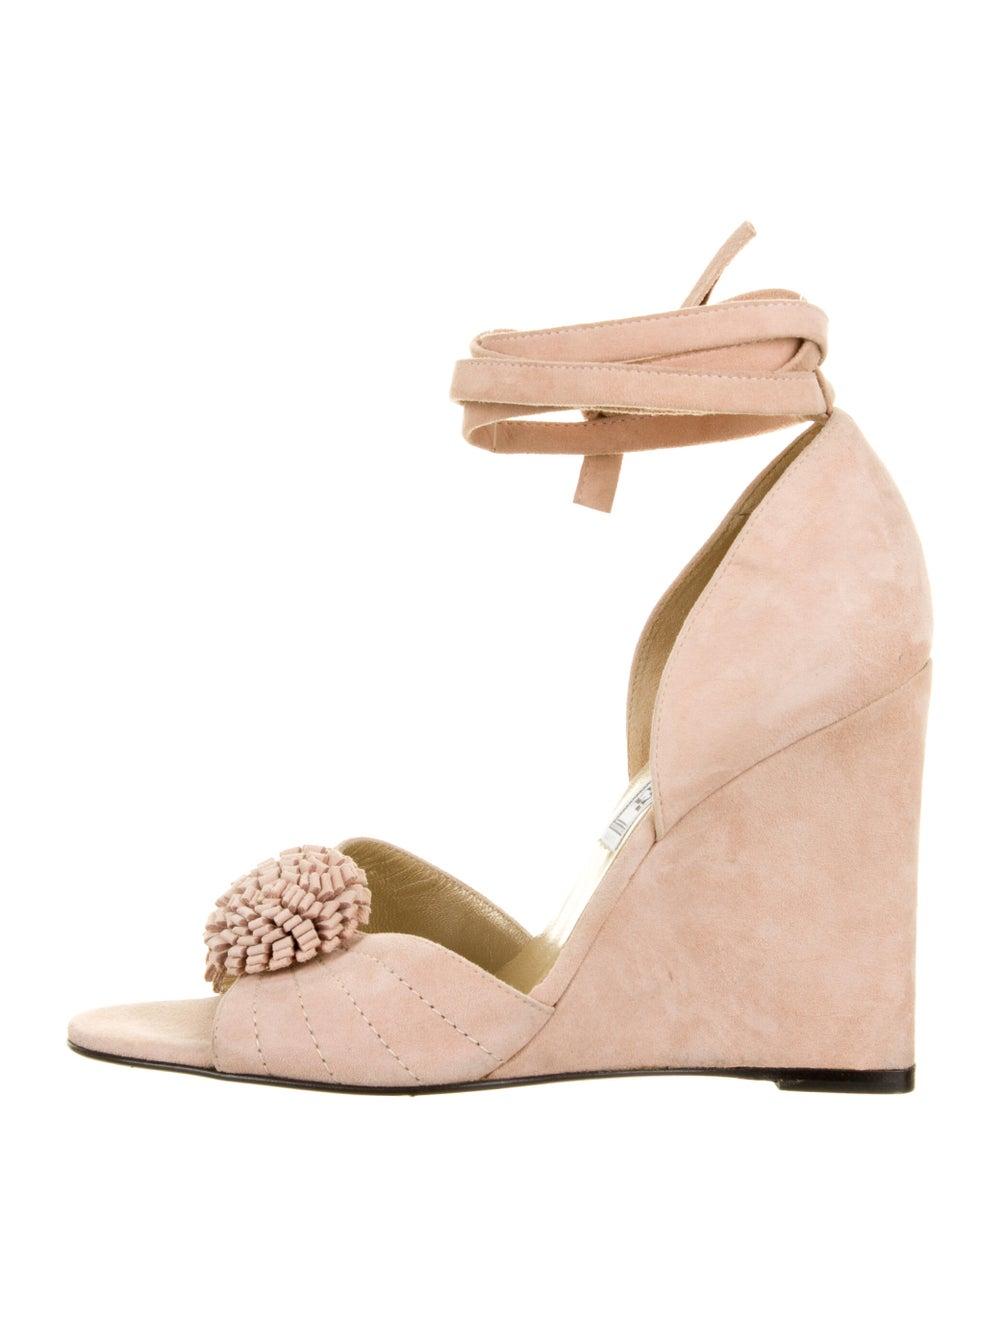 Gianni Versace Vintage Suede Sandals - image 1